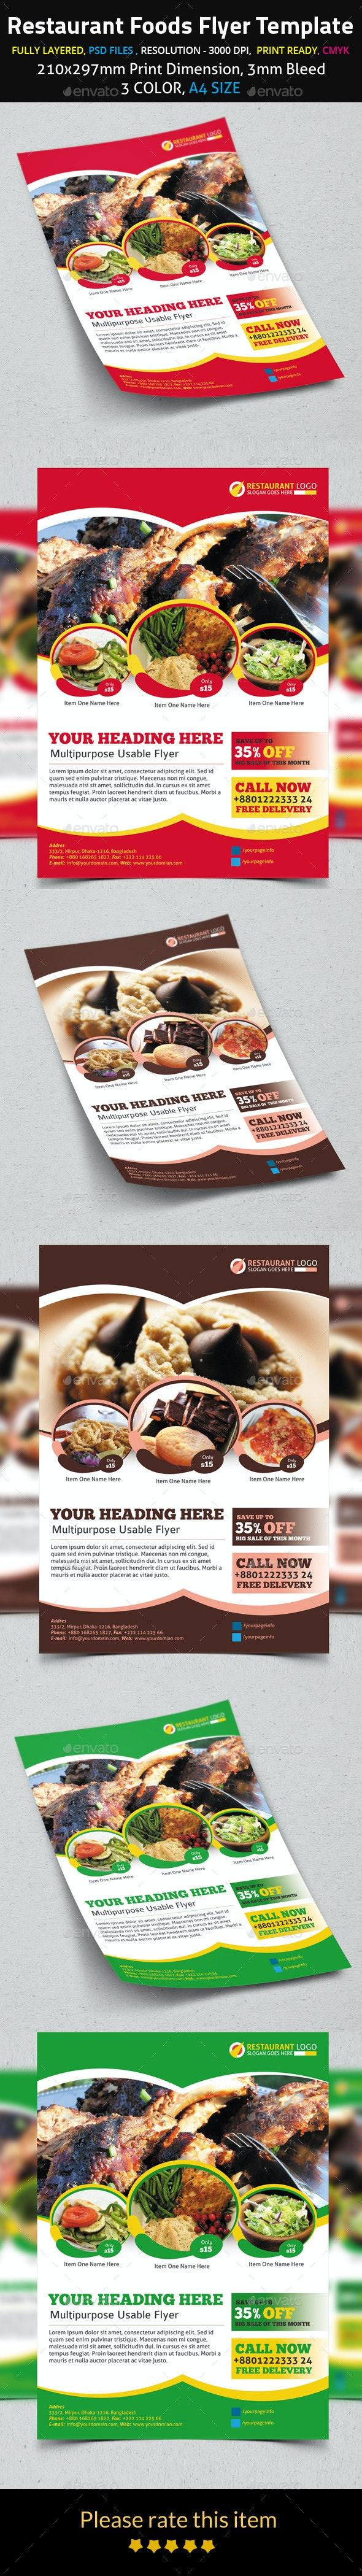 Restaurant Foods Flyer Template - Flyers Print Templates